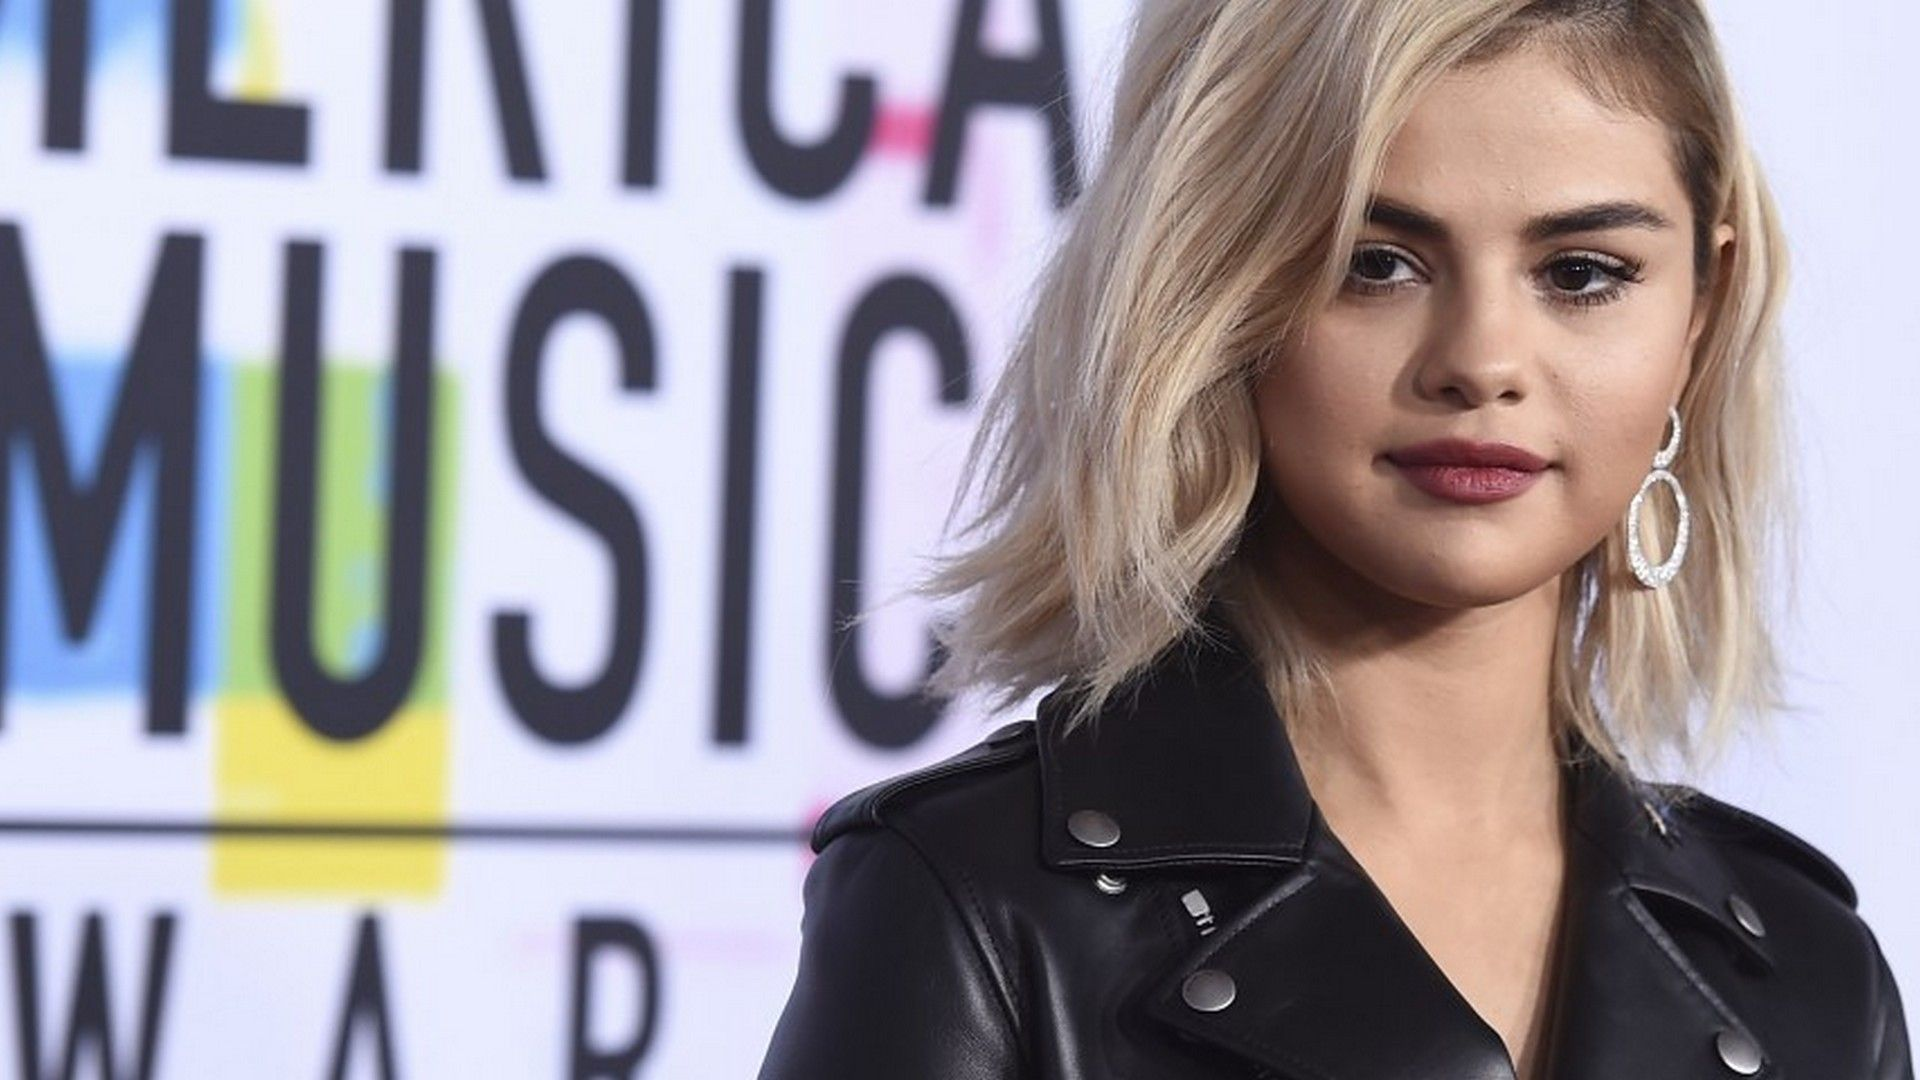 Hd Selena Gomez Blonde Wallpaper 2020 Live Wallpaper Hd Selena Gomez Selena Blonde